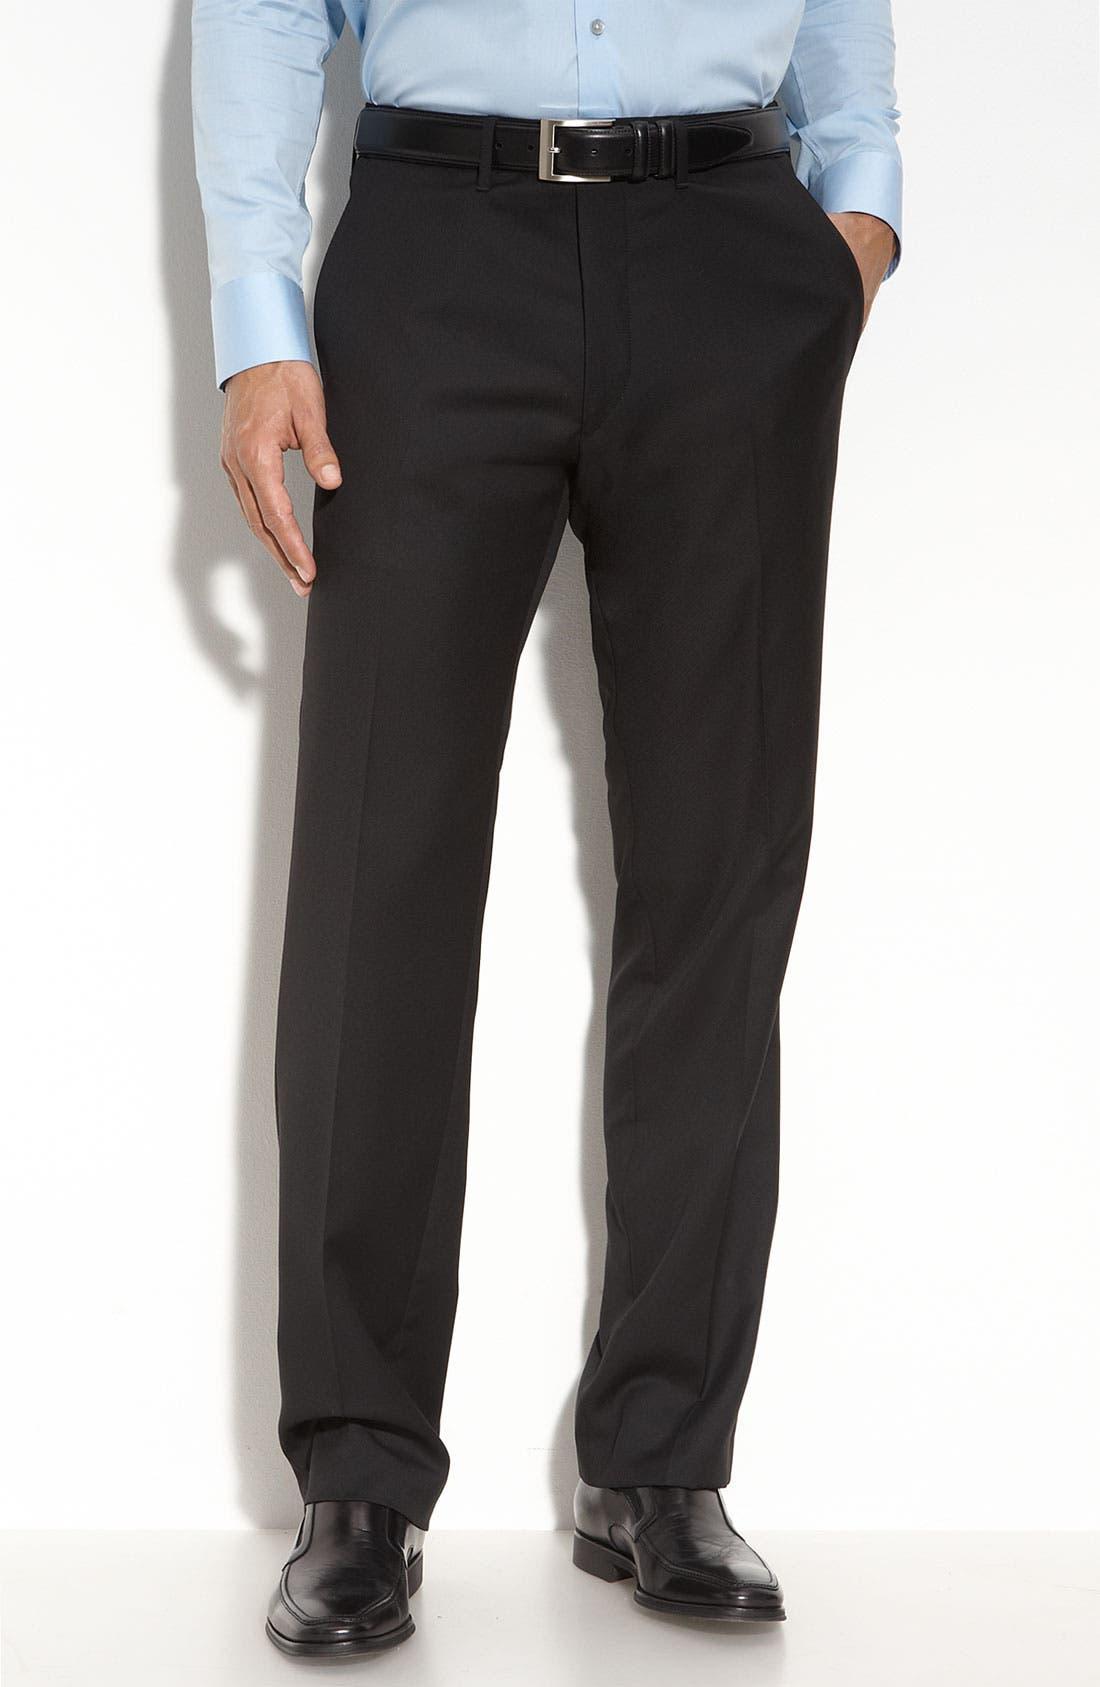 Alternate Image 1 Selected - BOSS Black 'Cagan' Flat Front Wool Trousers